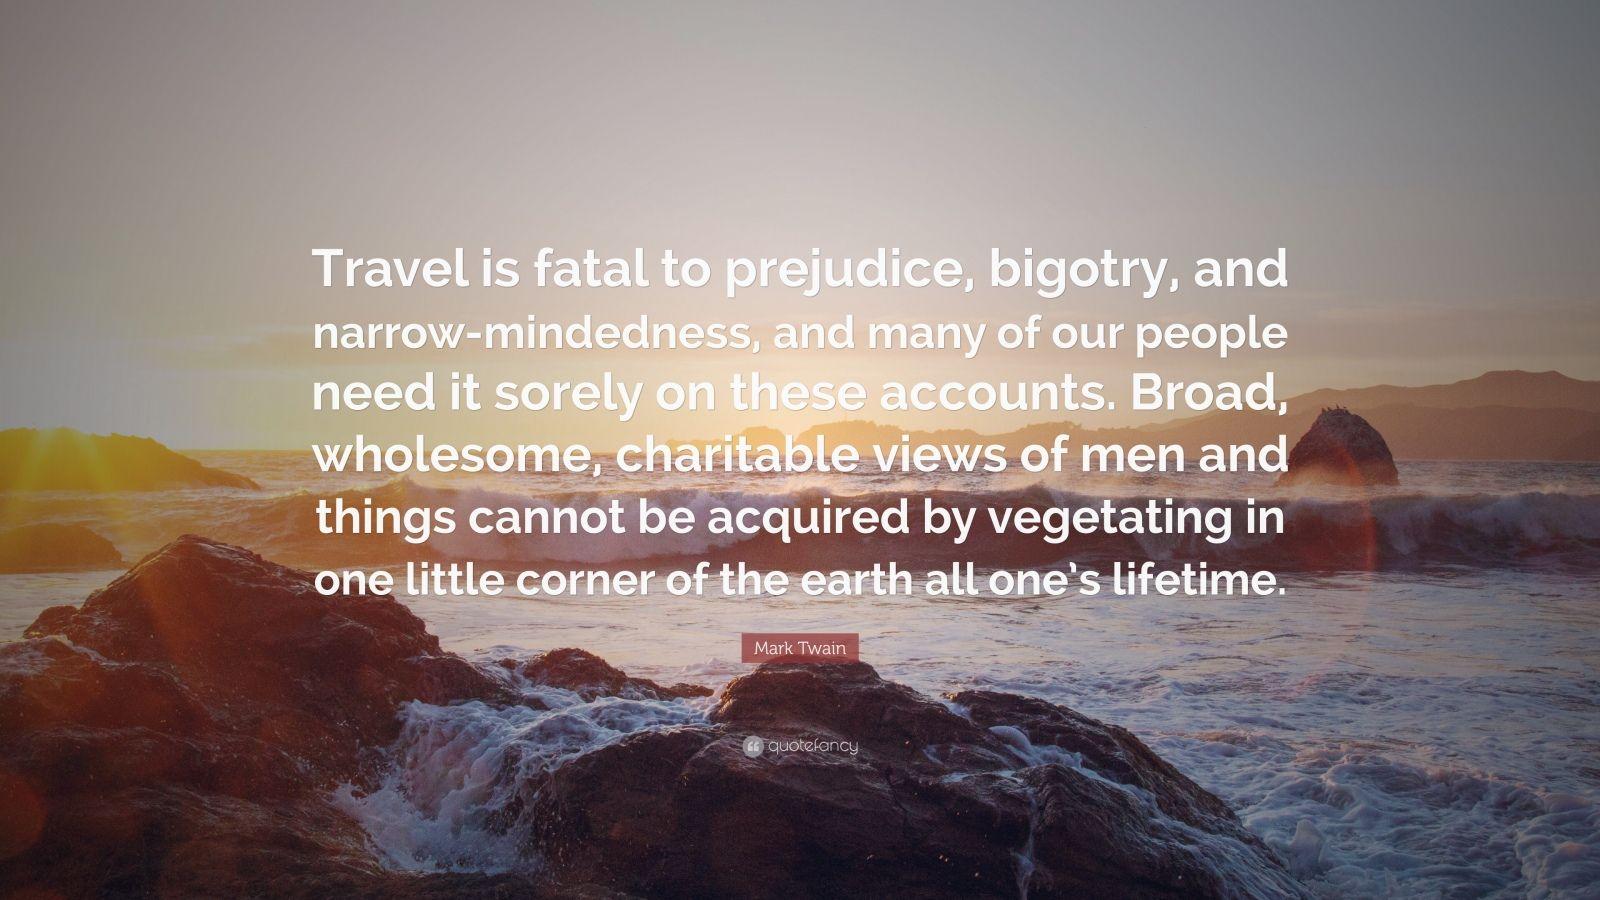 Mother Teresa Quotes Wallpapers Mark Twain Quote Travel Is Fatal To Prejudice Bigotry